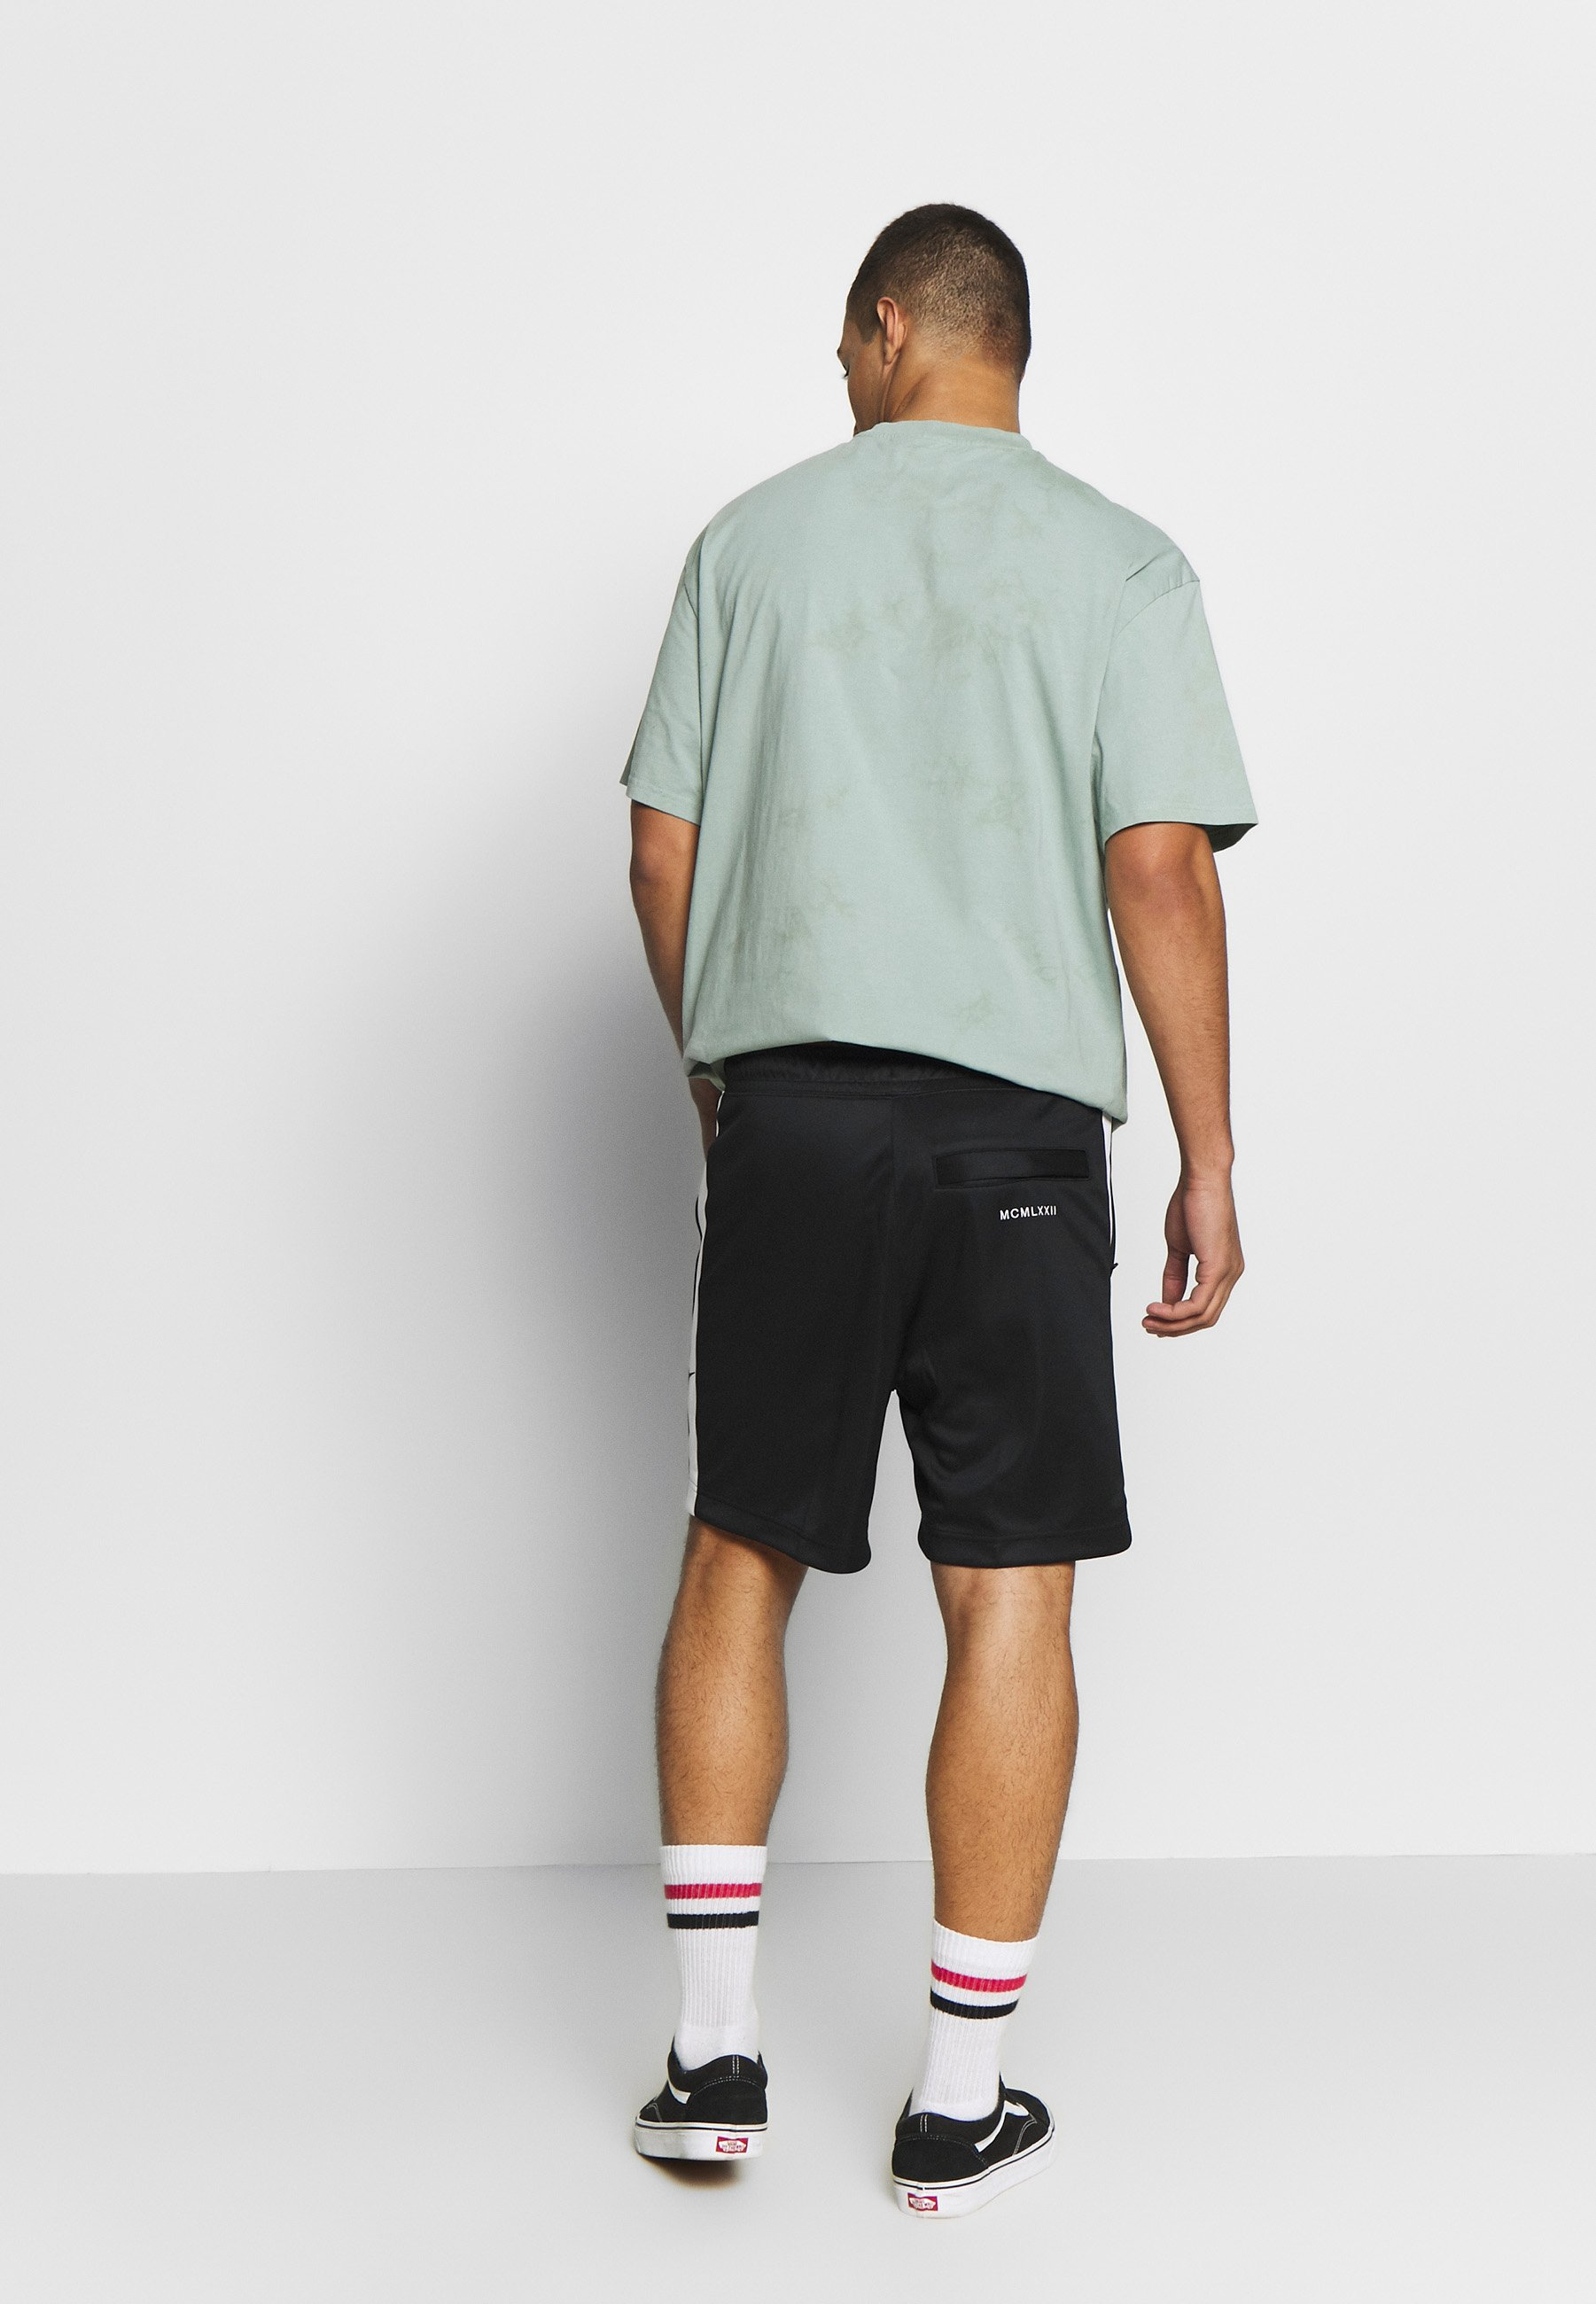 Nike Sportswear Short - Black/white